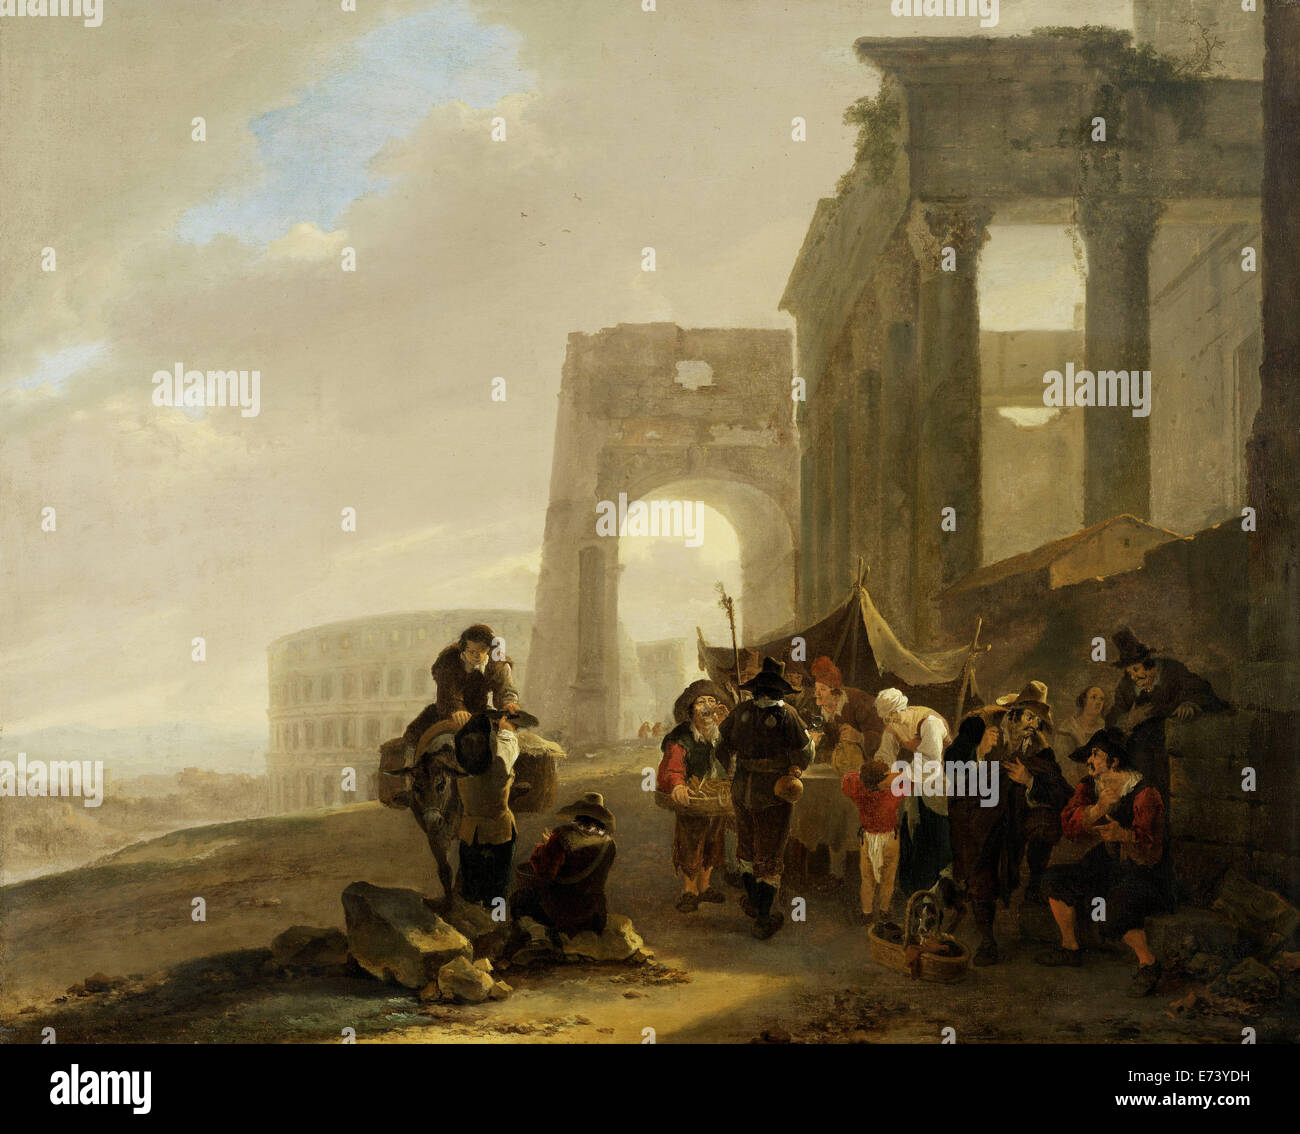 Scena Folk tra le rovine romane - da Jan entrambi, 1640 - 1652 Foto Stock